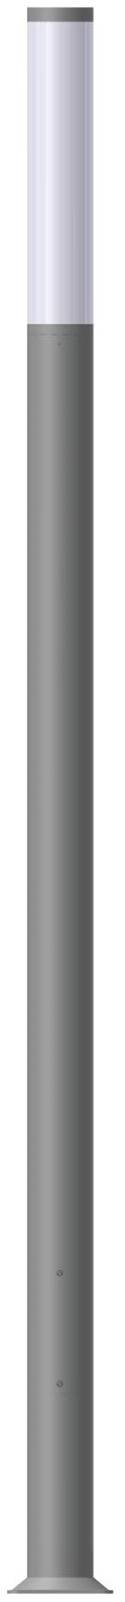 COLONNE LED KARIN 4800 LED